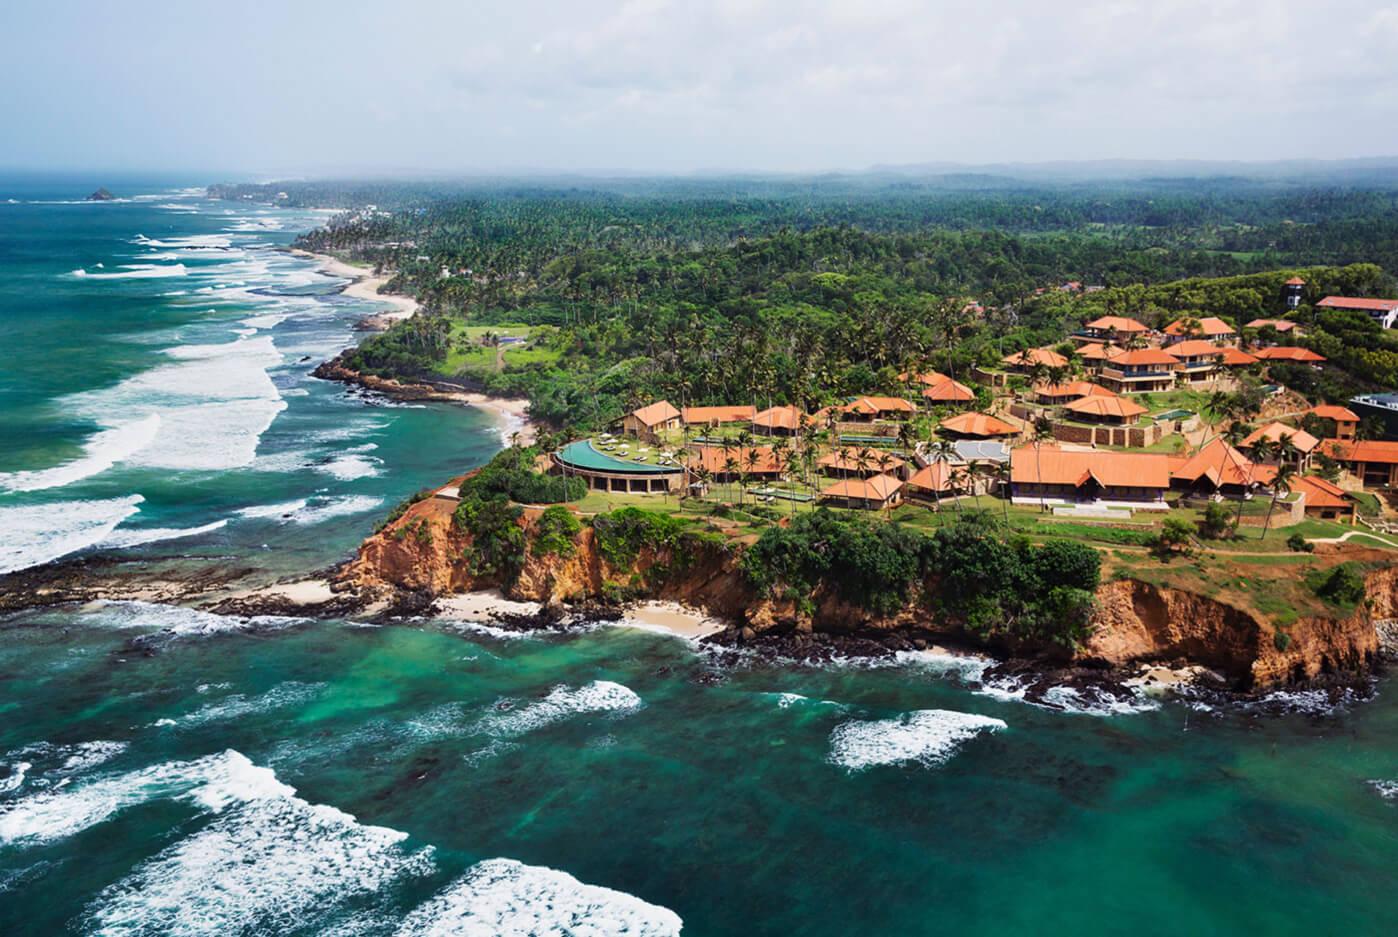 Aerial View Cape Weligama in Sri Lanka